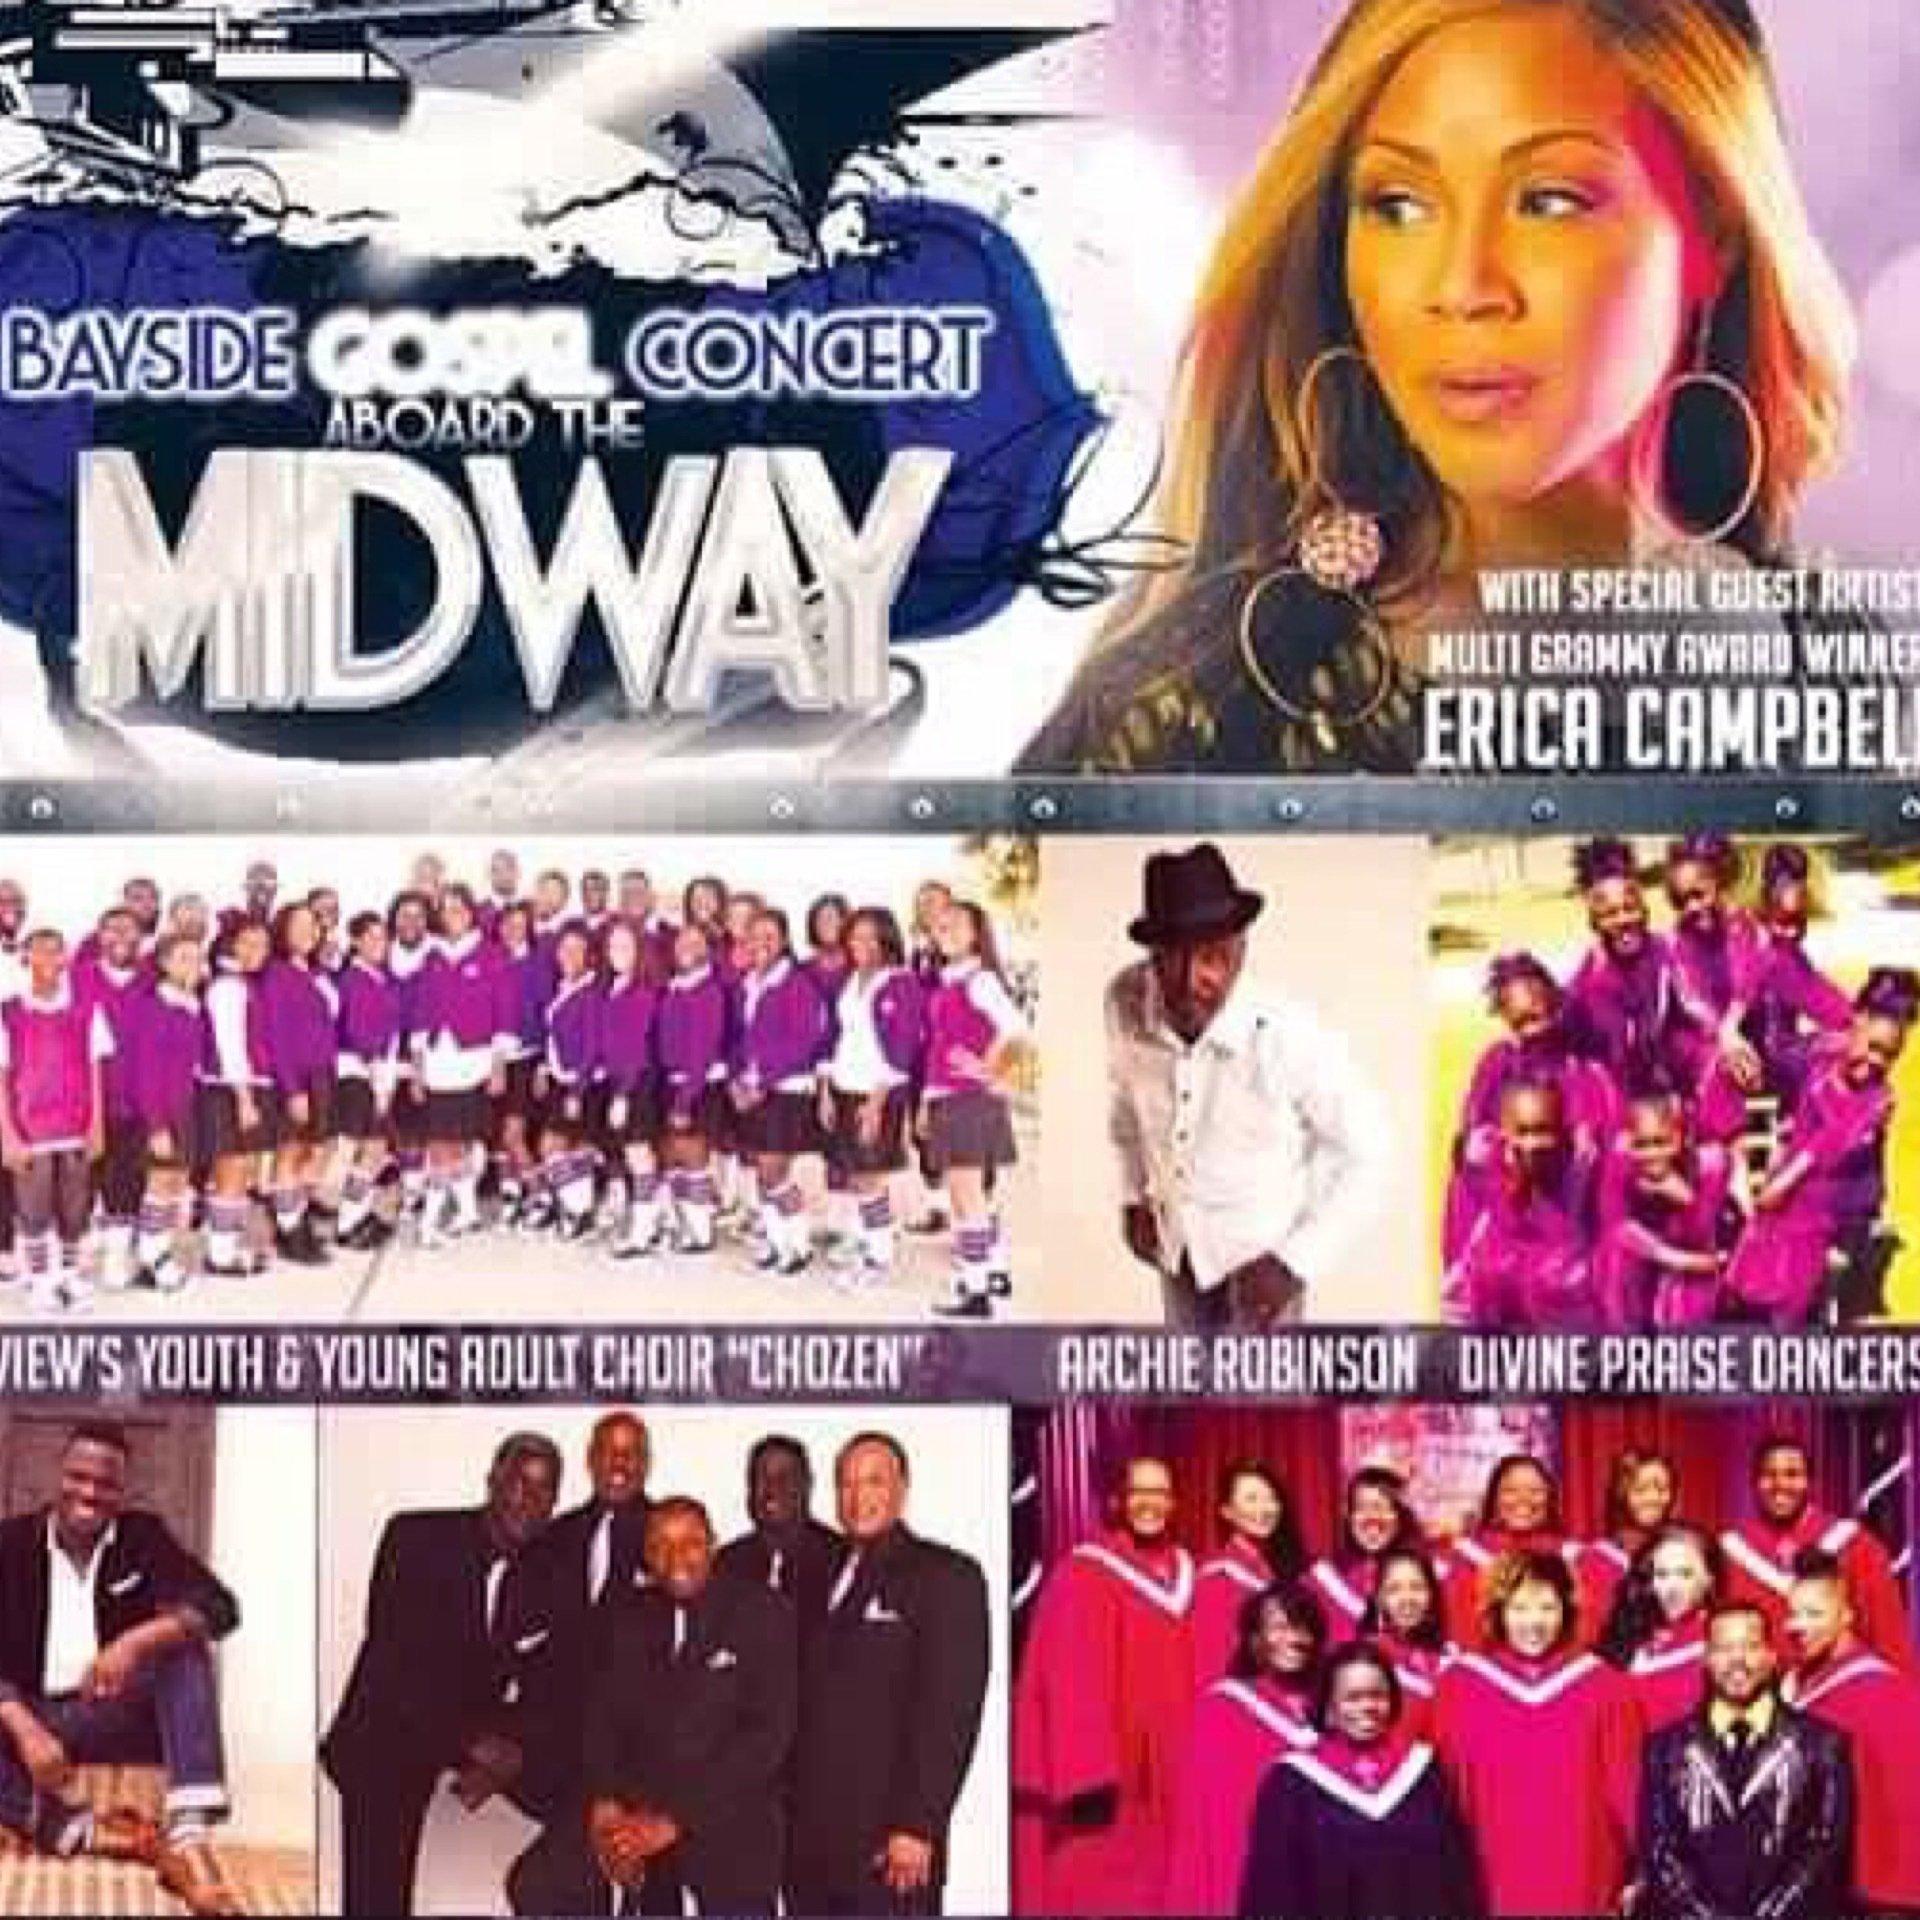 Midway General Admission 2015 9E3F92D1-0F8B-480F-9899-502FD4CF7A8D